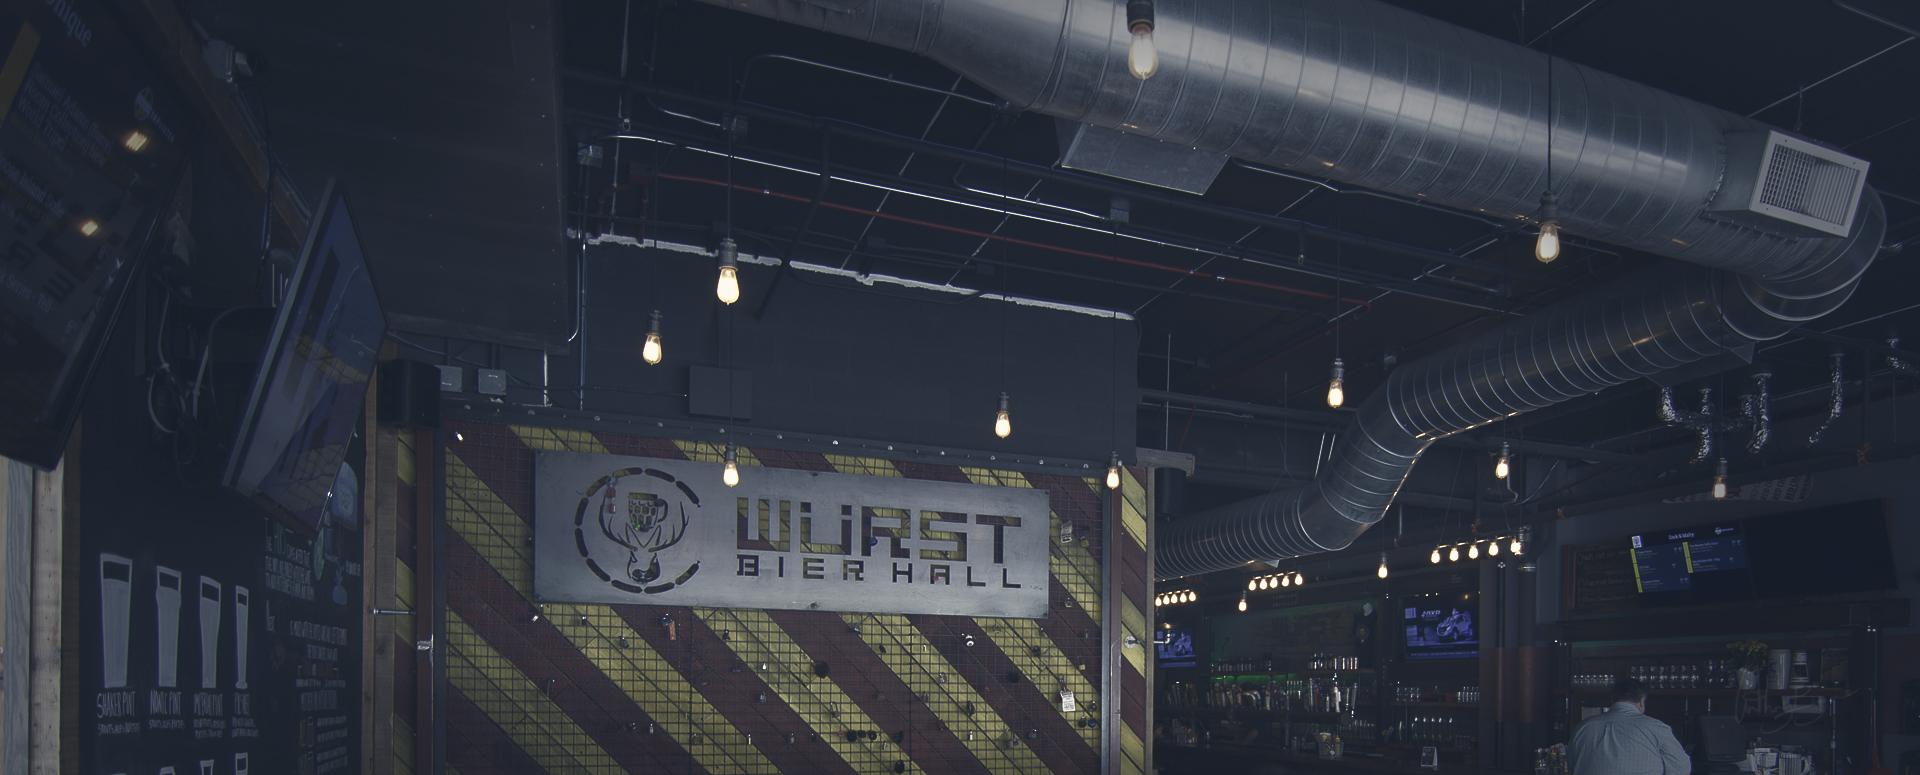 NDHA-05-Wurst-Bier-Hall